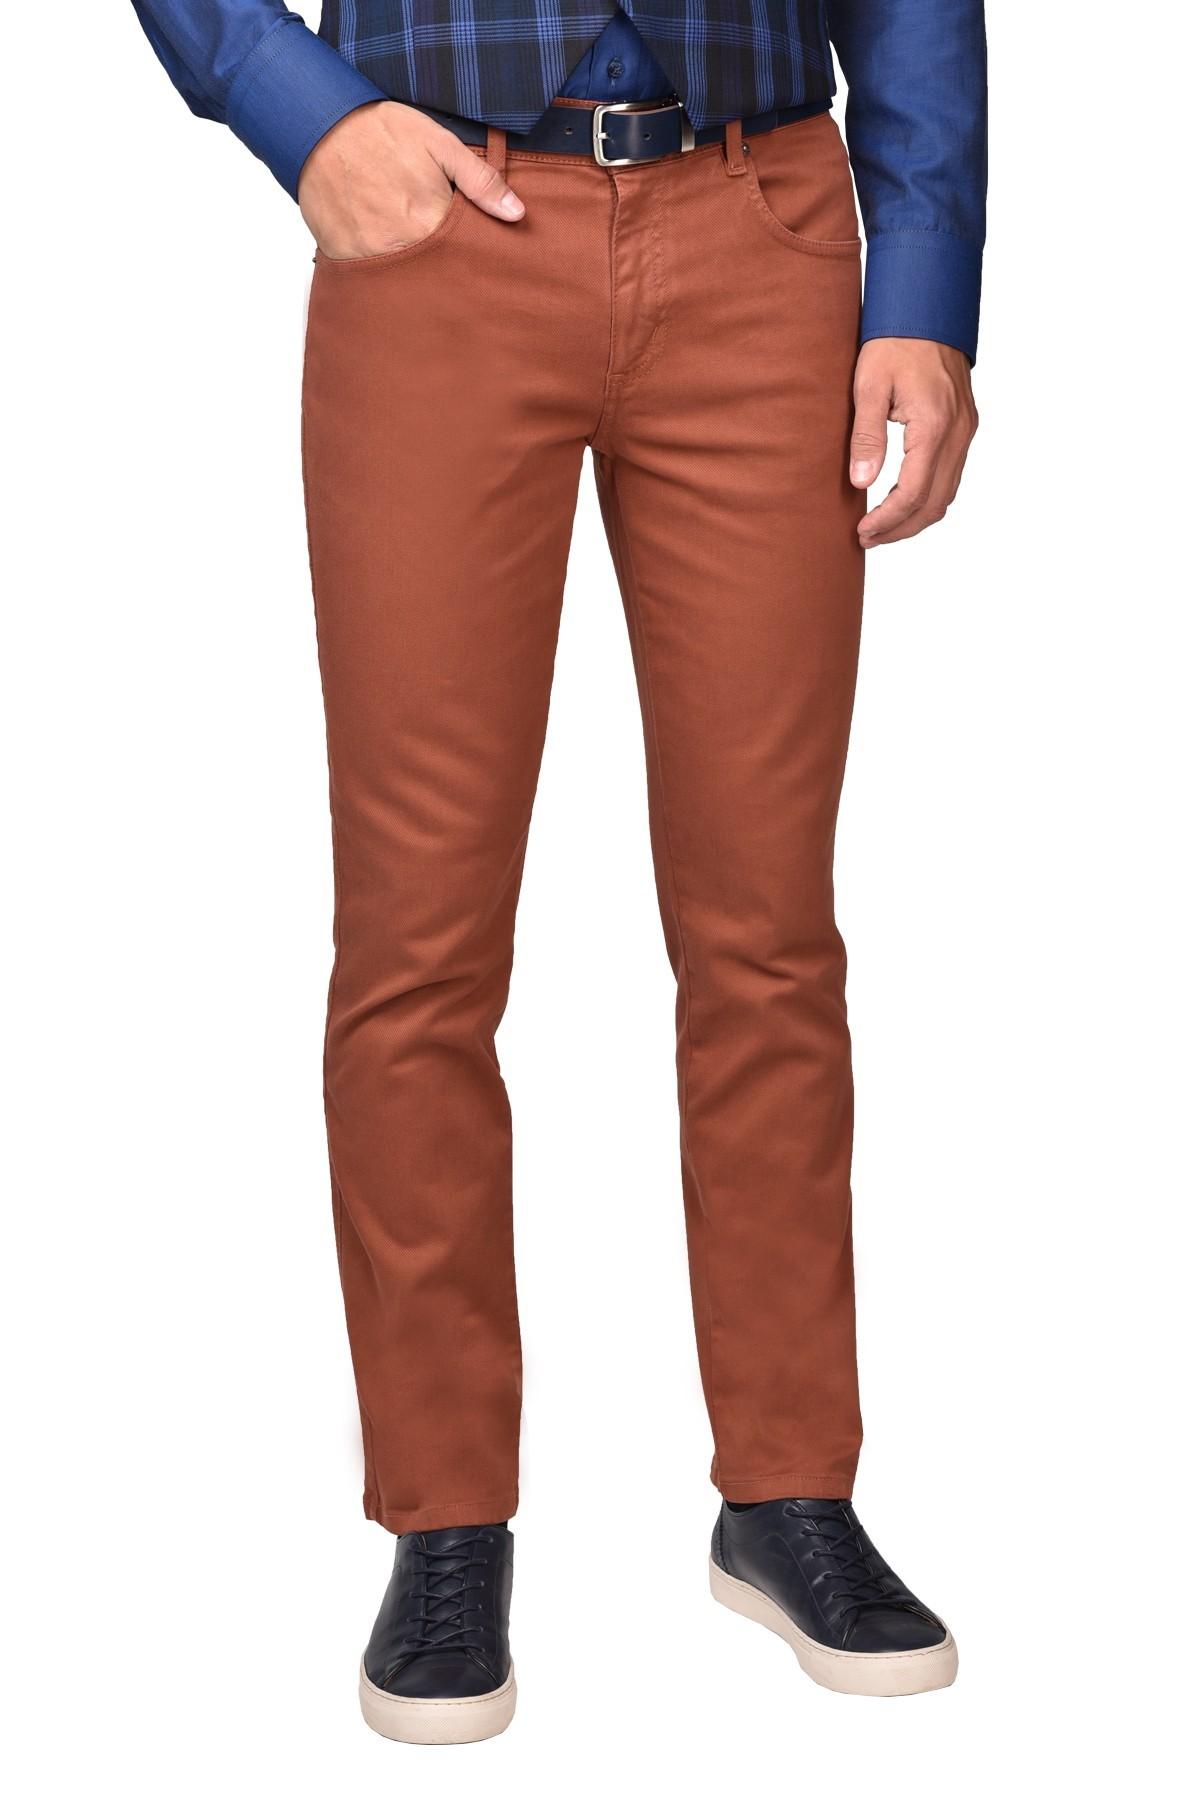 Rude spodnie męskie casual